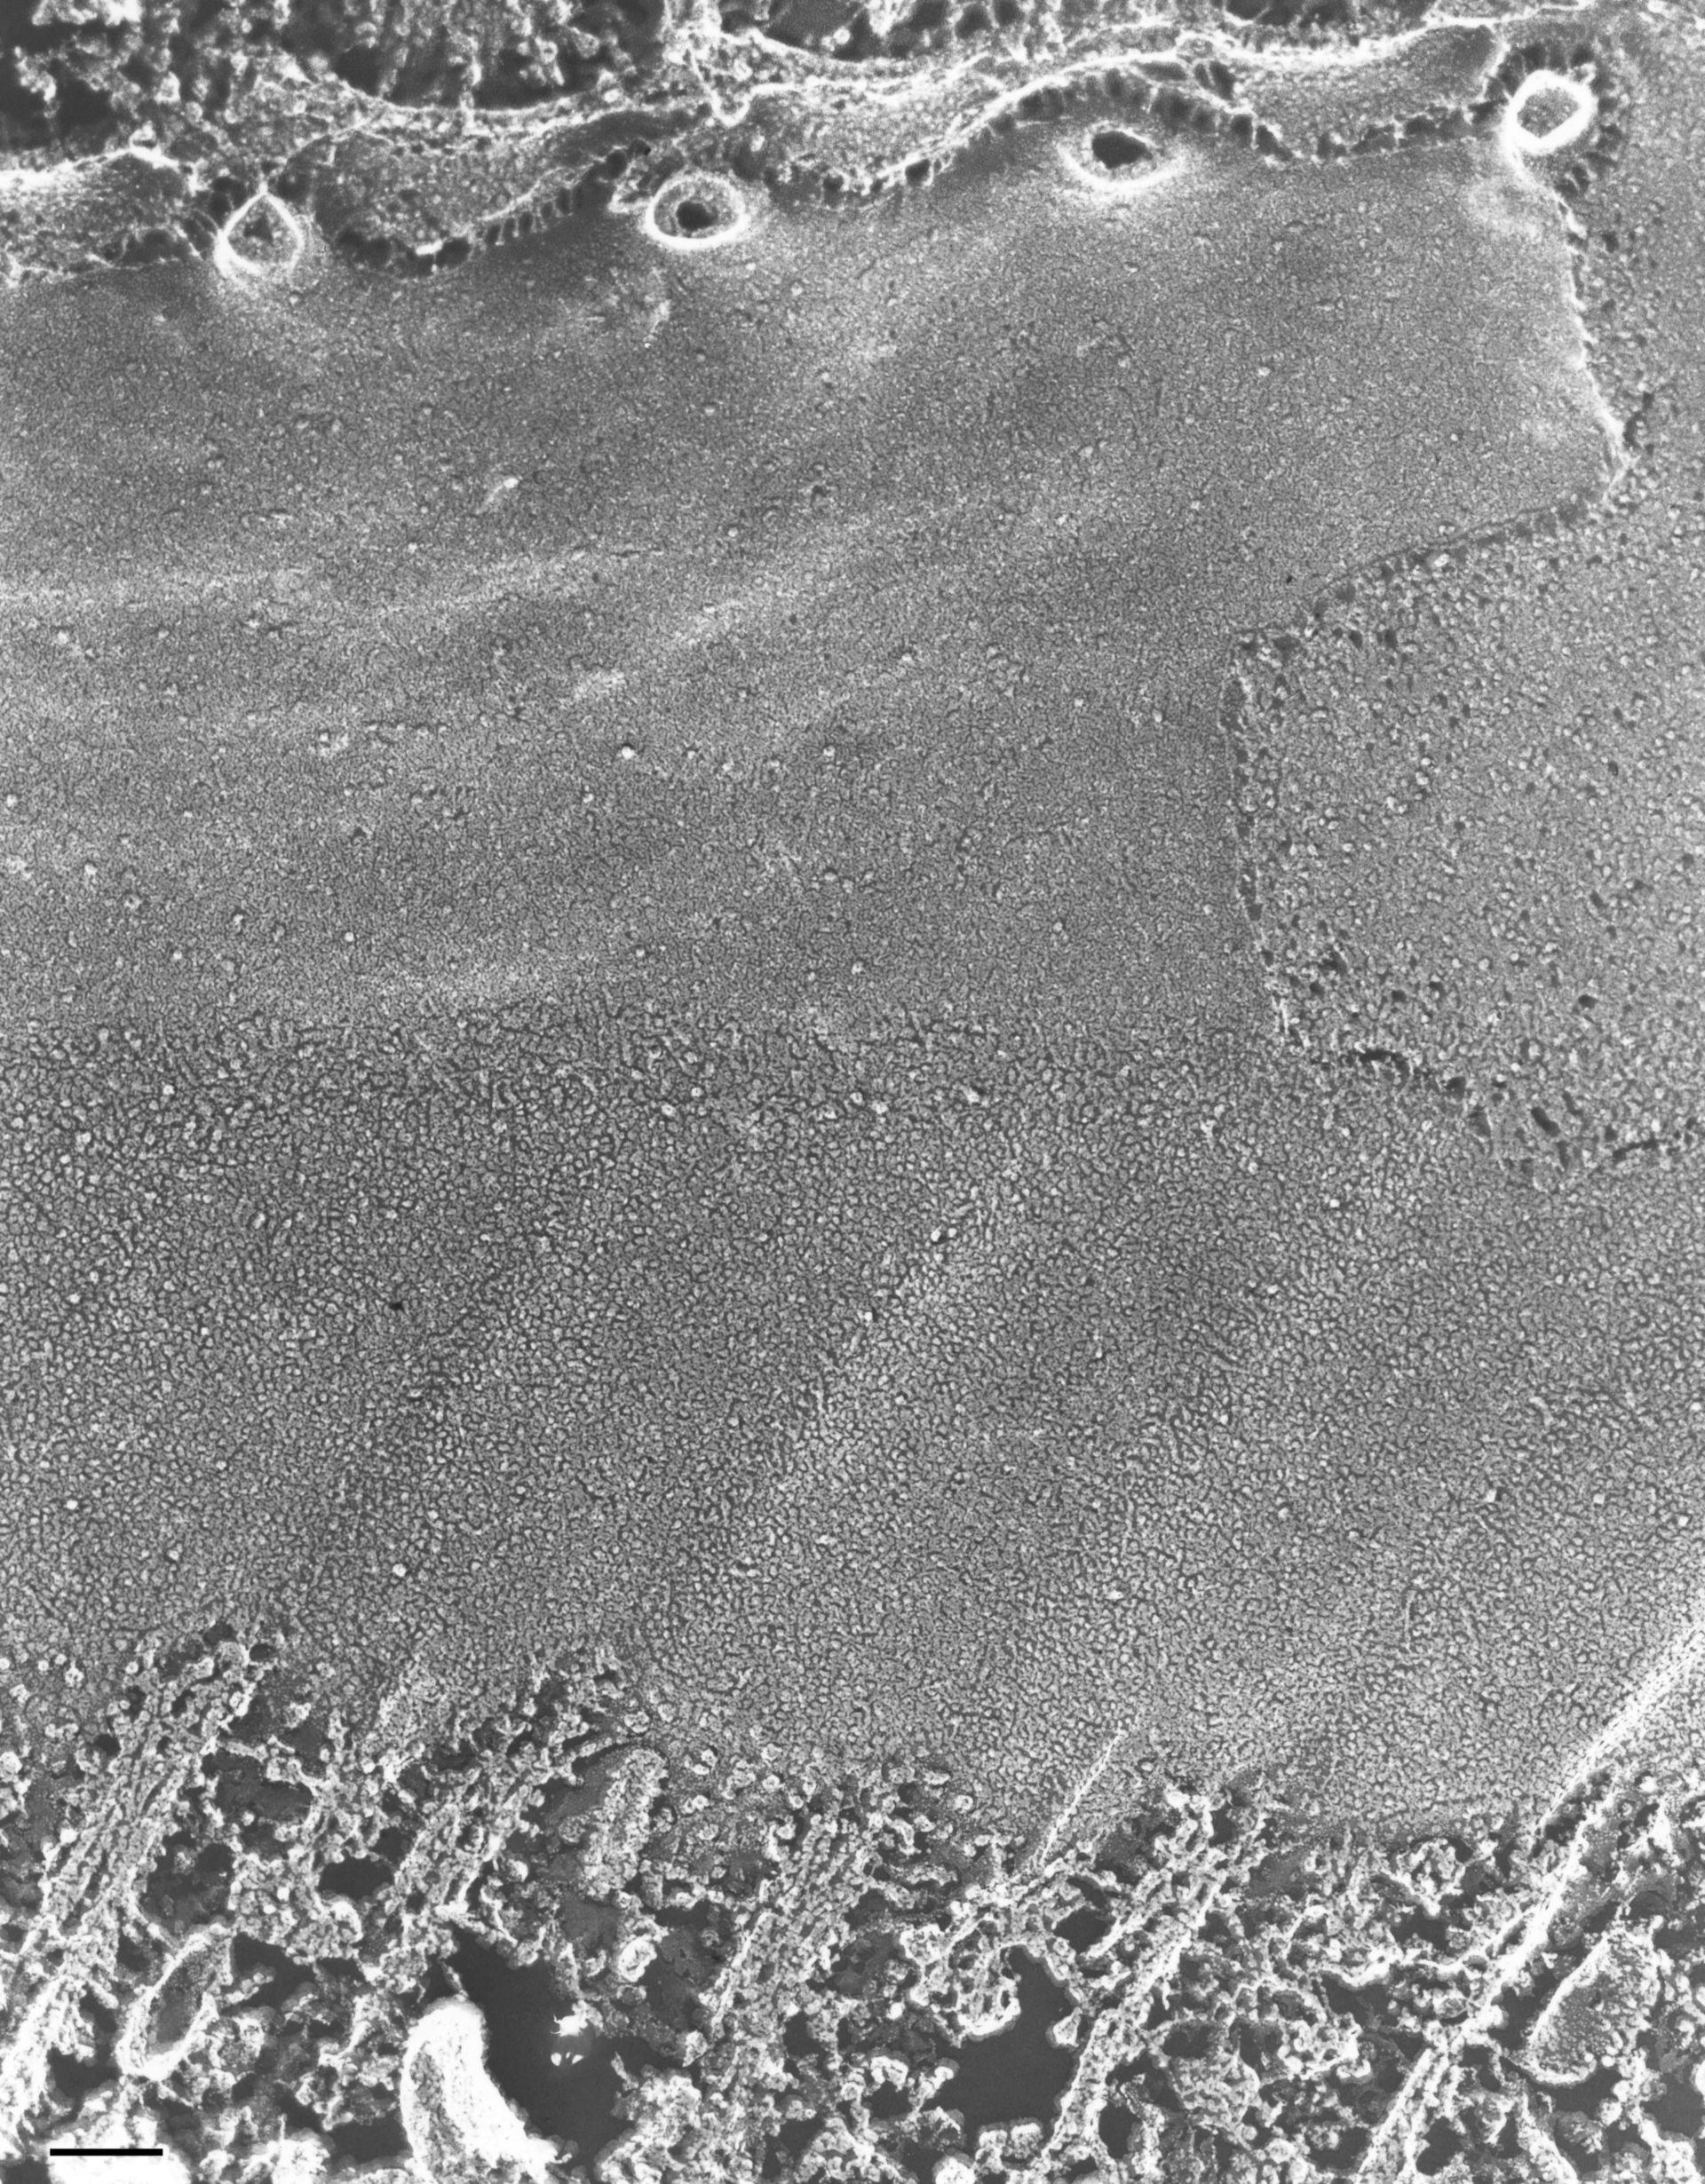 Paramecium multimicronucleatum (complesso associato ai microtuboli) - CIL:36701